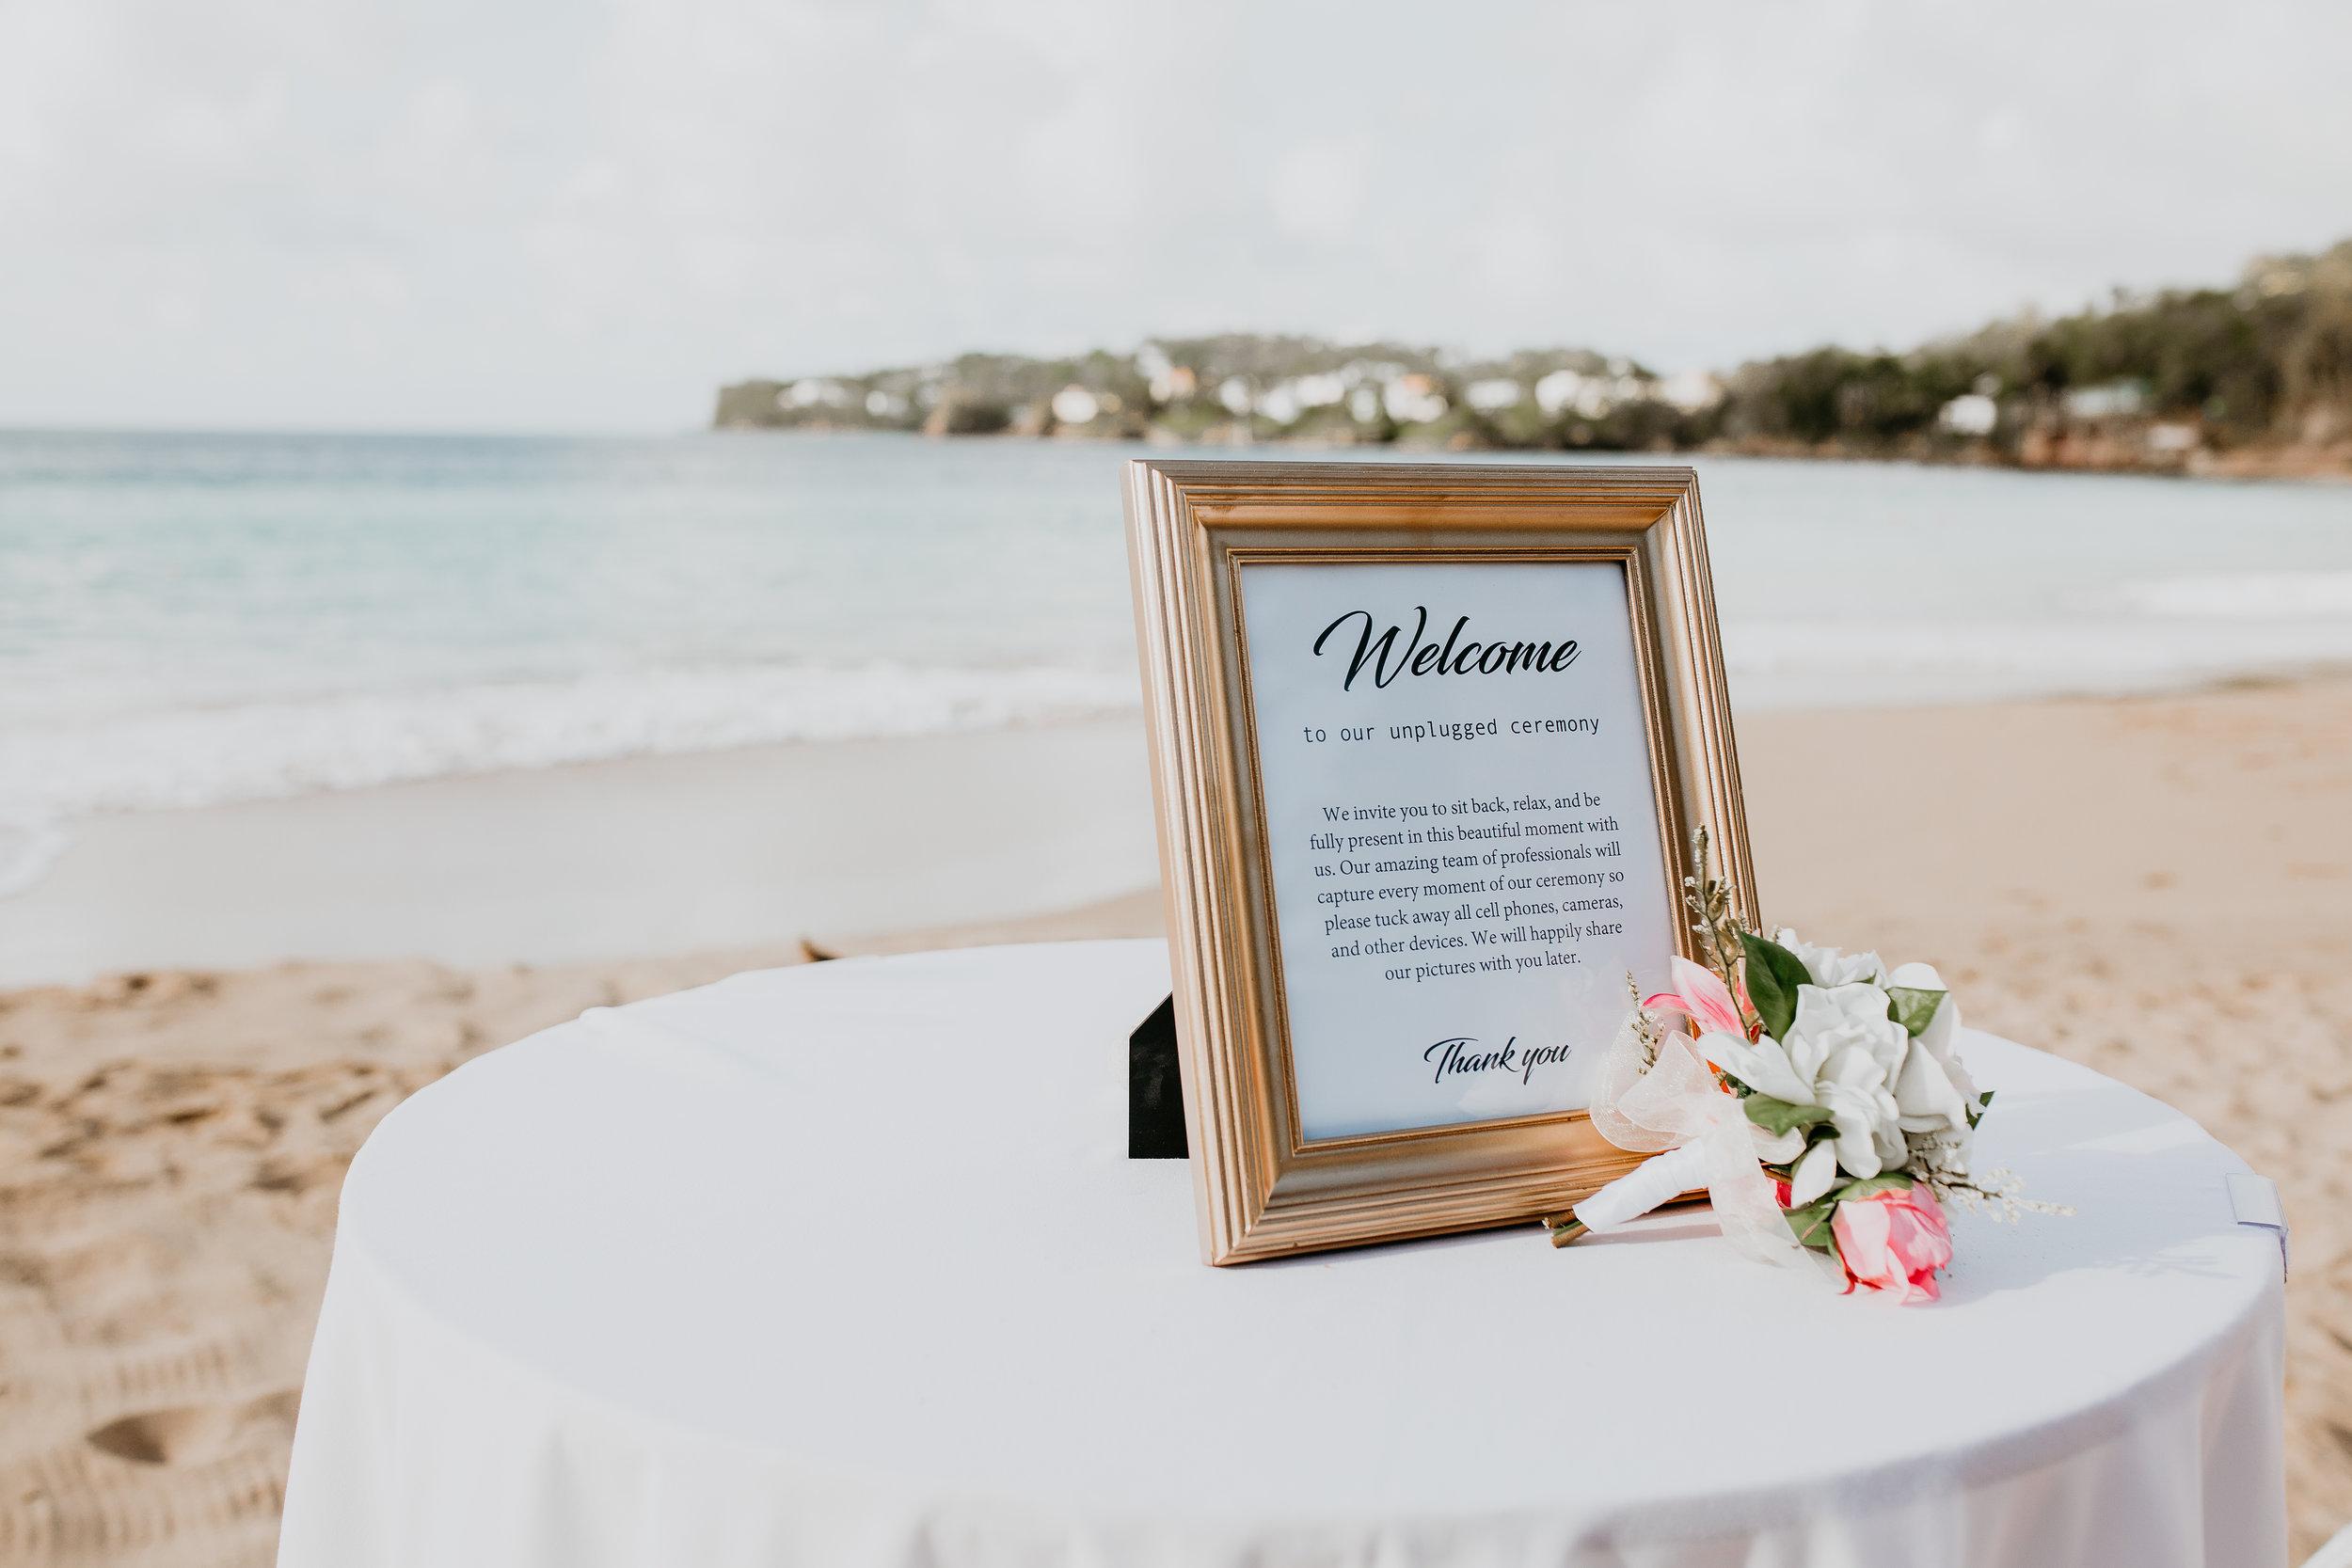 nicole-daacke-photography-destination-wedding-in-st-lucia-sandals-la-toc-intimate-island-wedding-carribean-elopement-photographer-chill-island-wedding-54.jpg